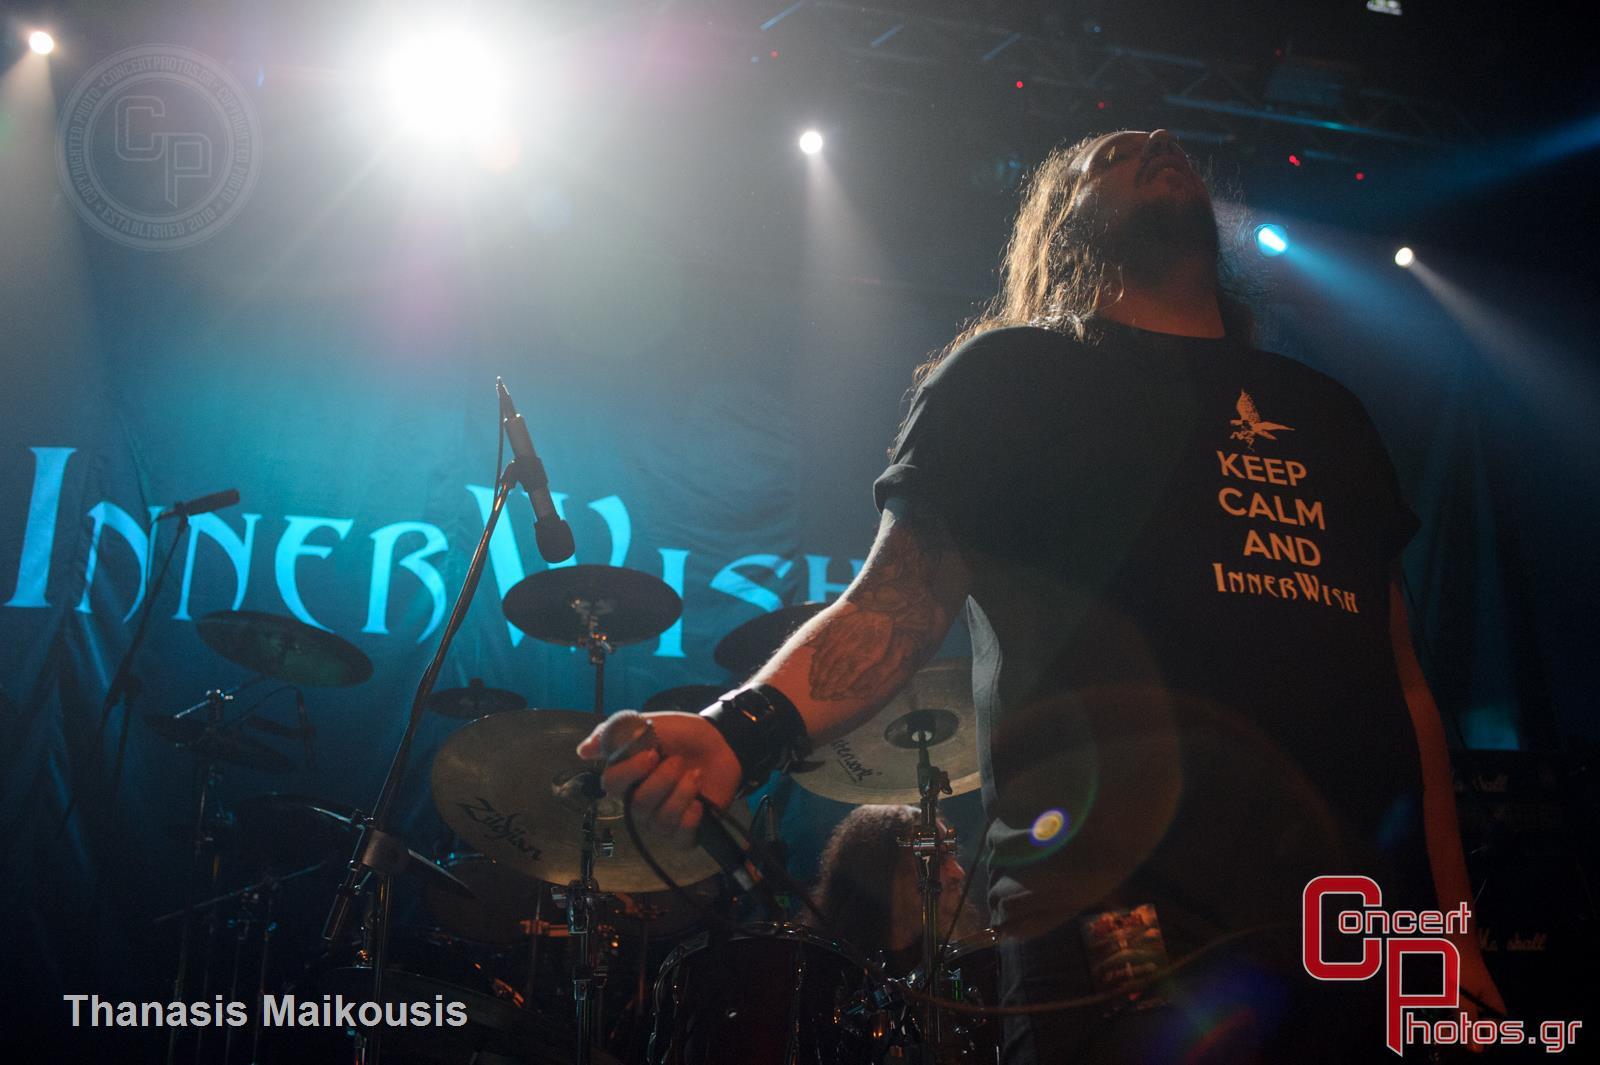 Saxon & Innerwish -Saxon Innerwish Gagarin photographer: Thanasis Maikousis - concertphotos_20141025_21_12_41